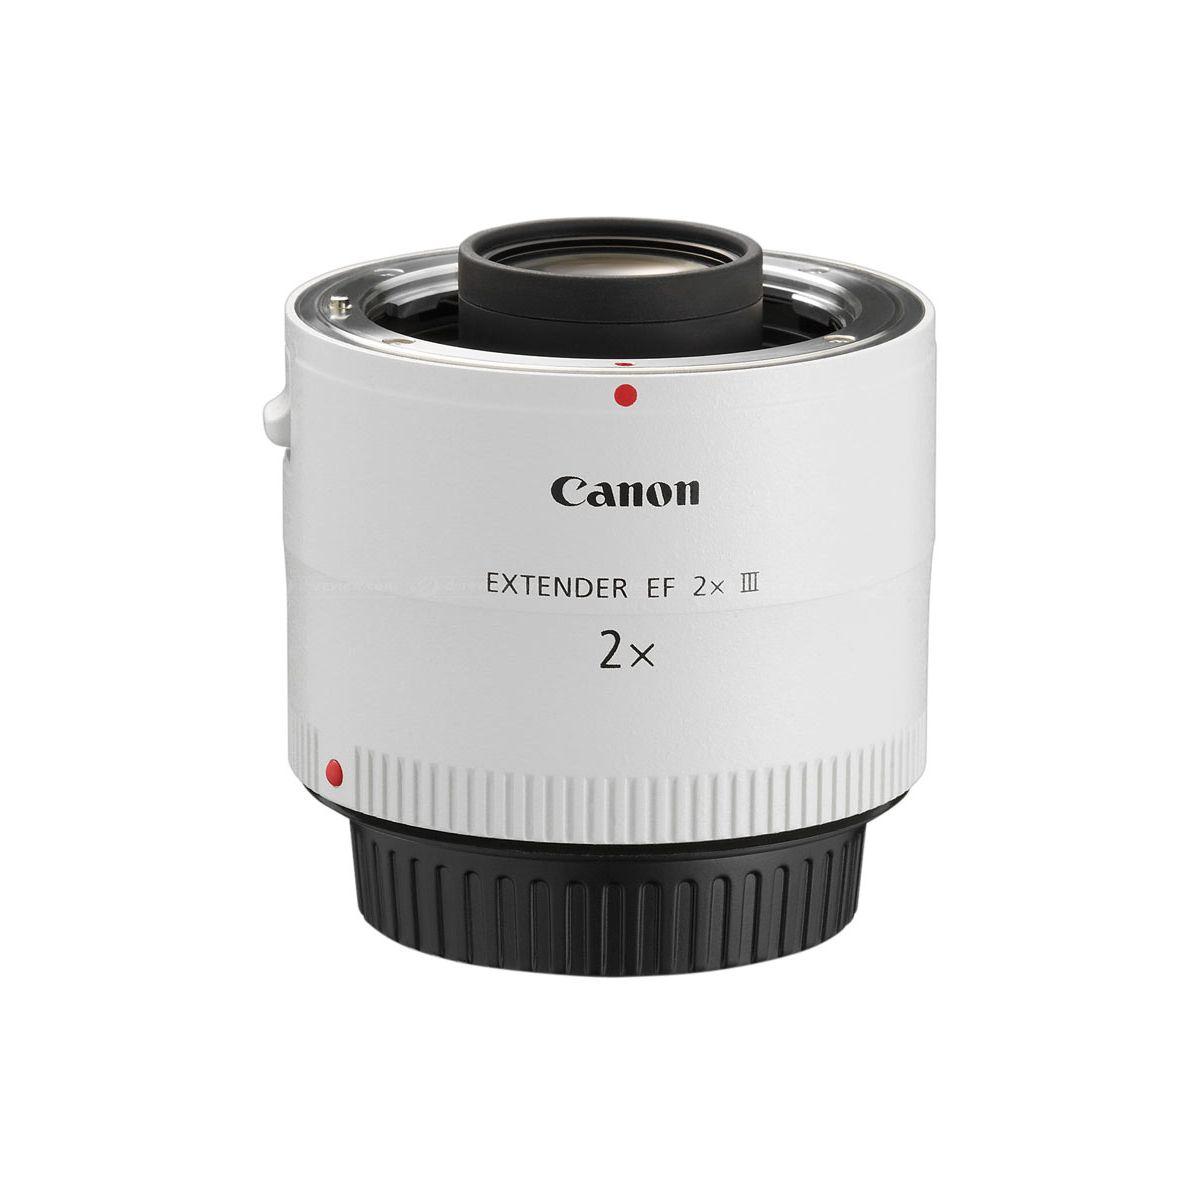 Multiplicateur canon extender ef 2x iii